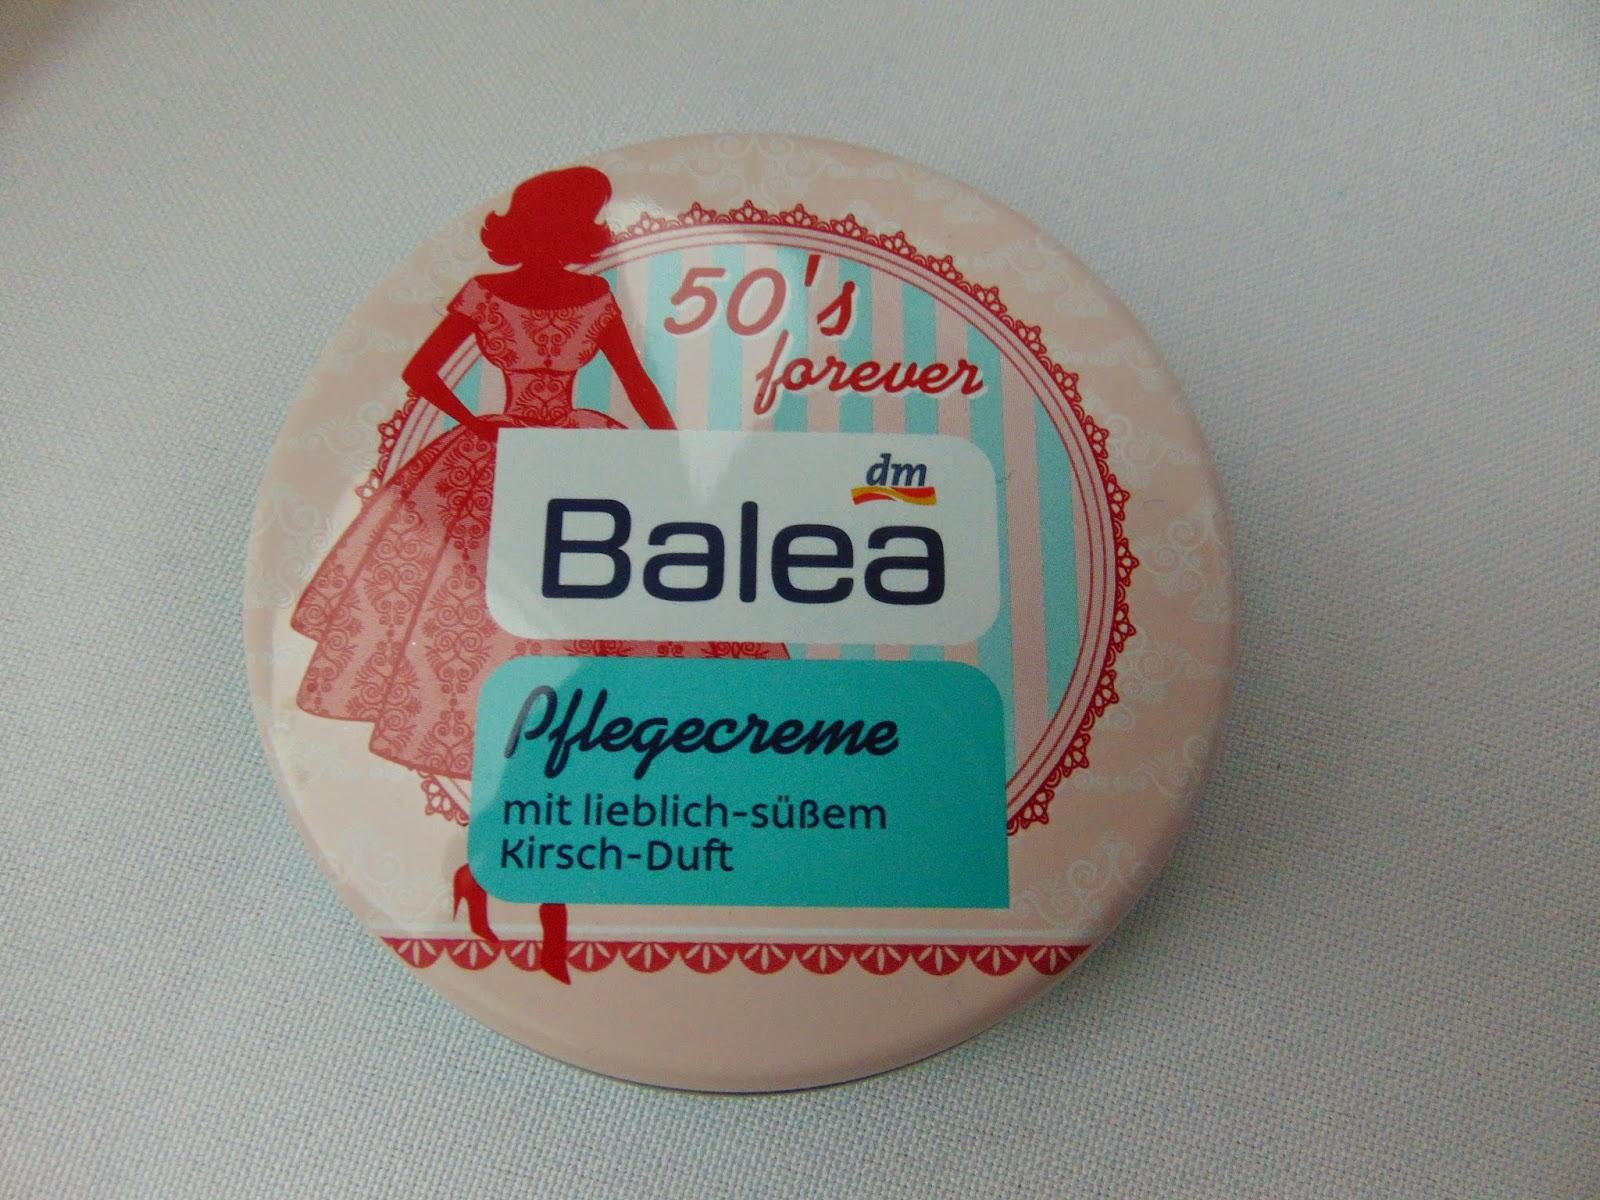 Balea Pflegecreme - 50's Forever - www.annitschkasblog.de